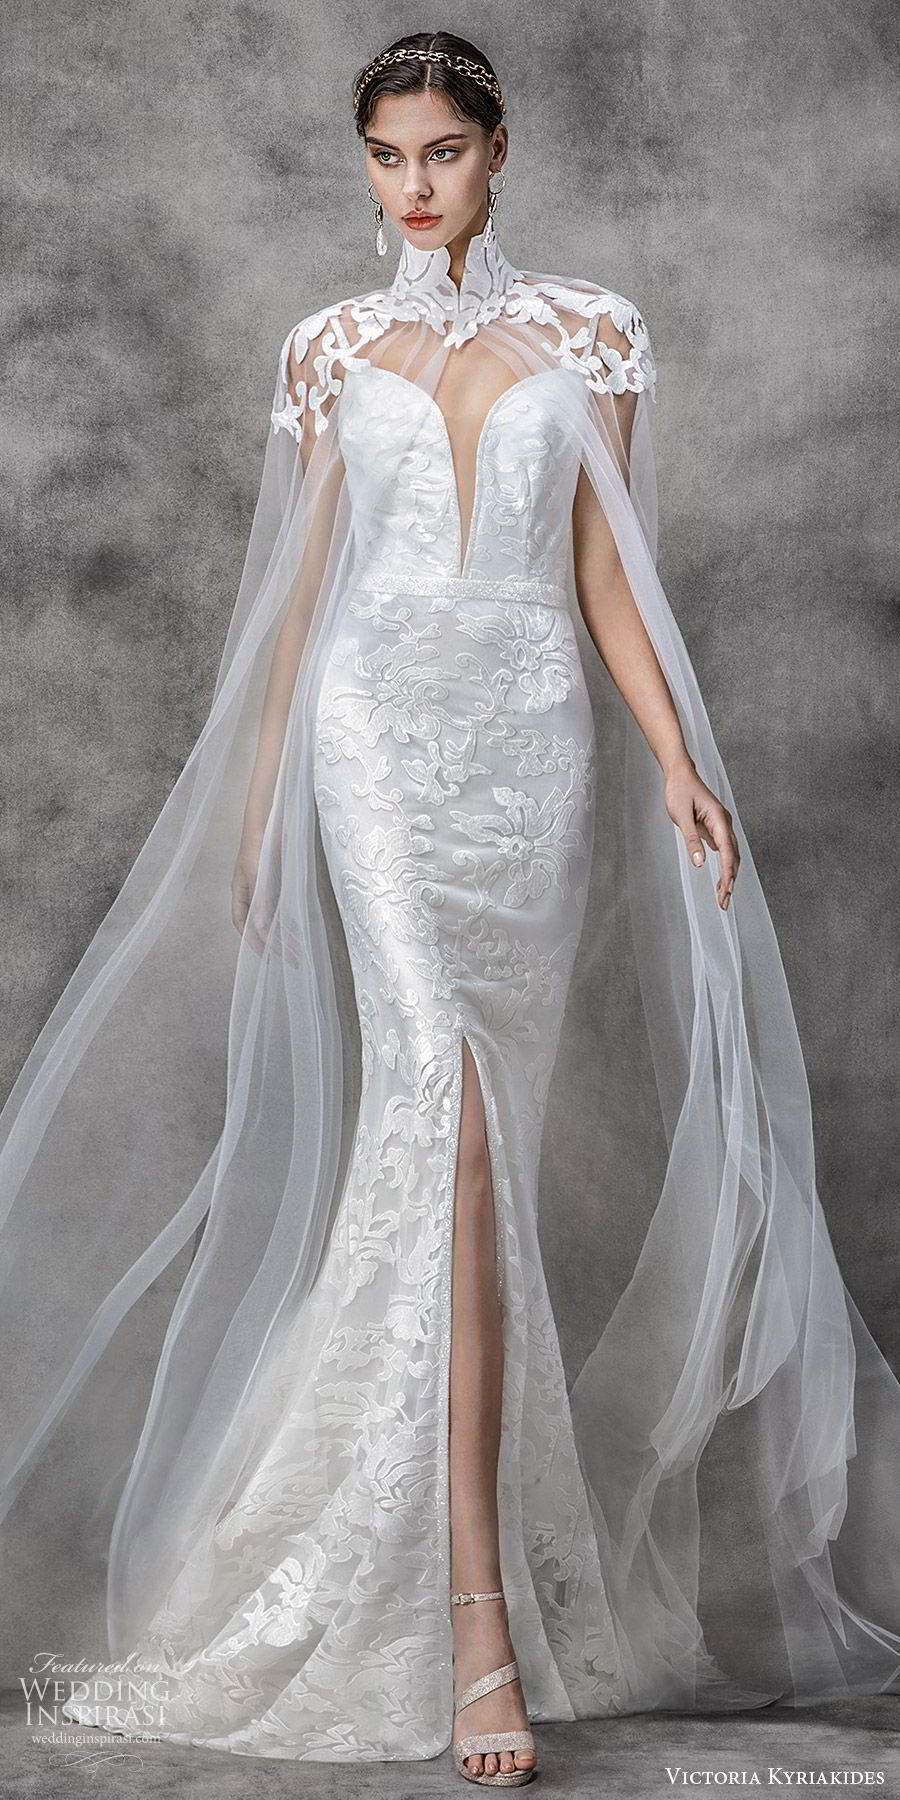 victoria kyriakides spring 2020 bridal sleeveless straps split sweetheart neckline embroidered sheath wedding dress slit skirt (1) sheer high neck cape mv